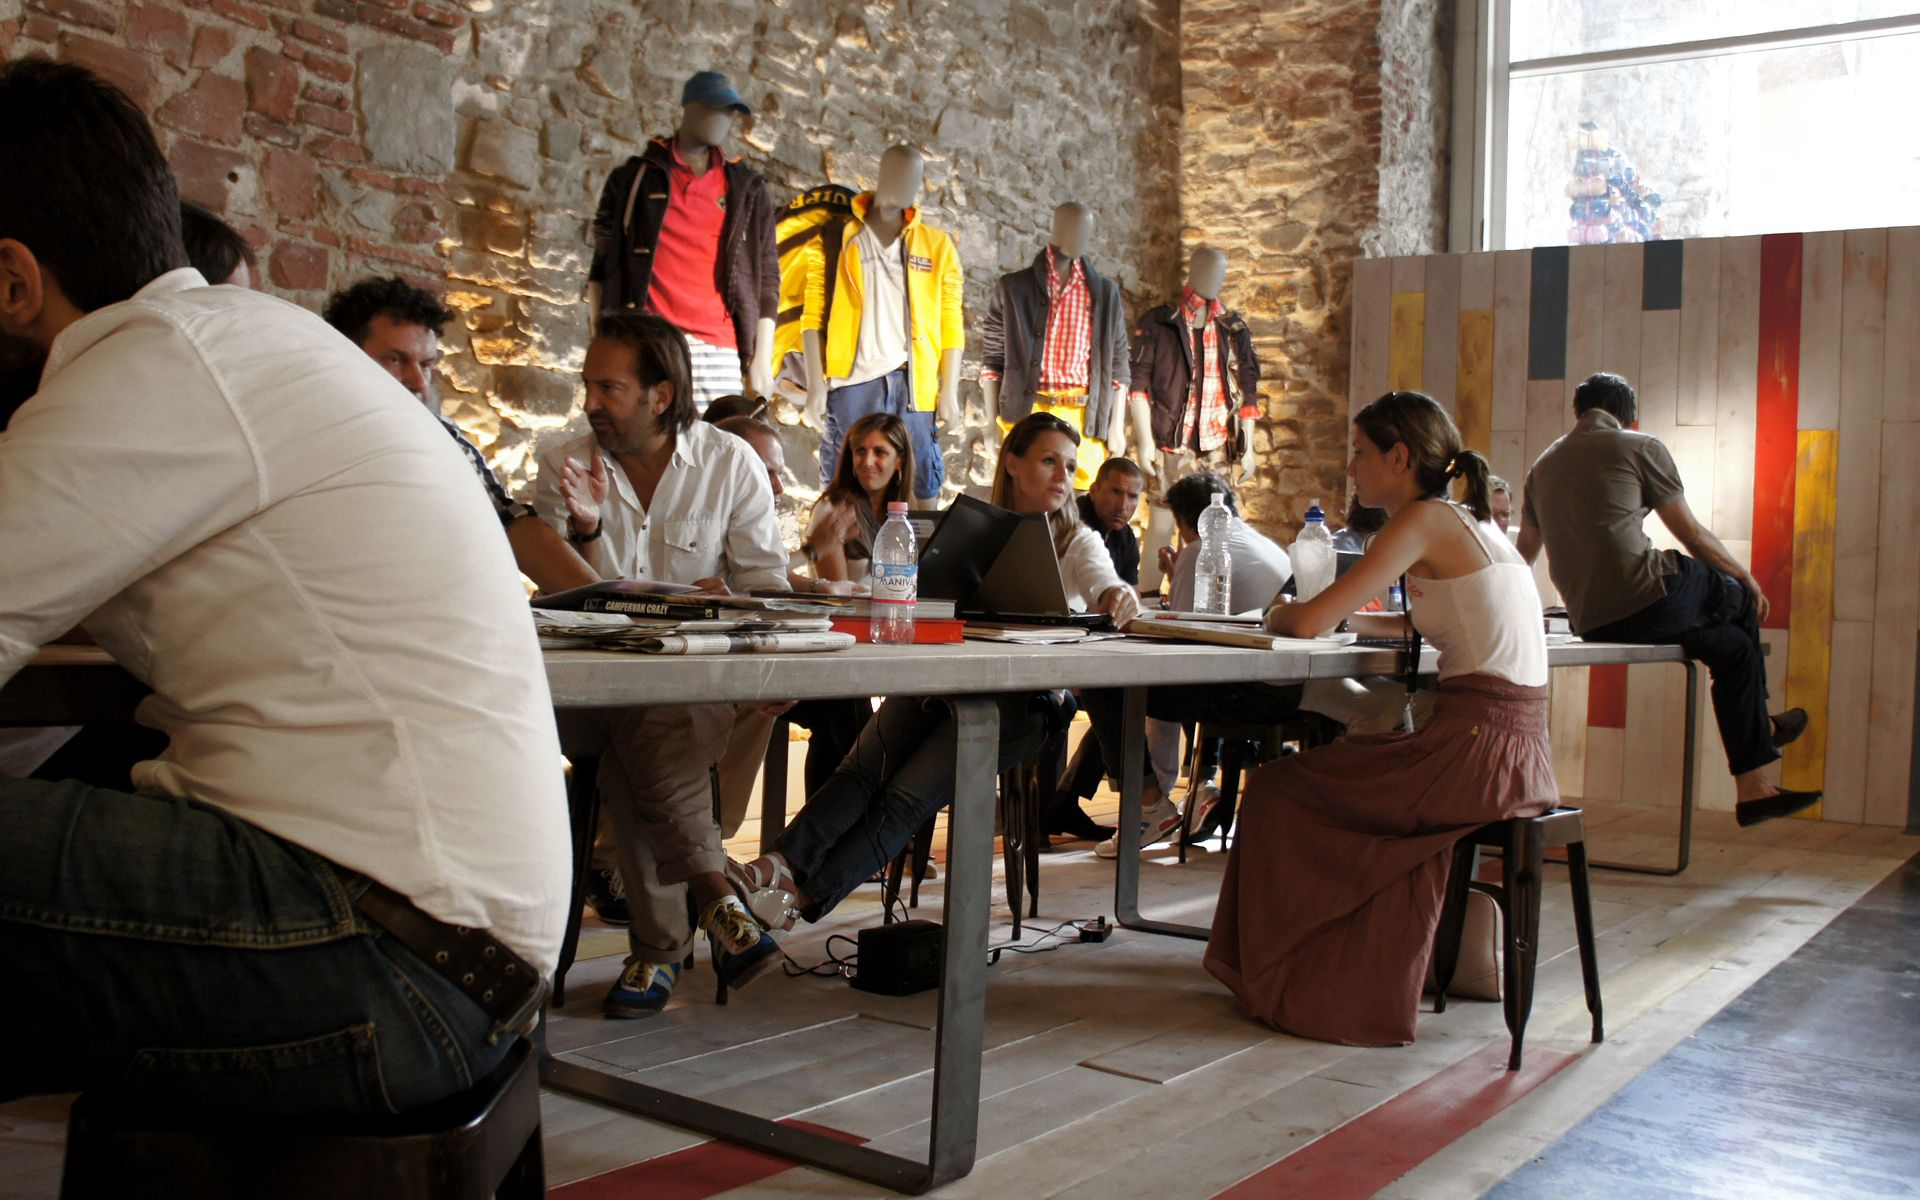 Pitti Immagine Uomo - Spring Summer 2012